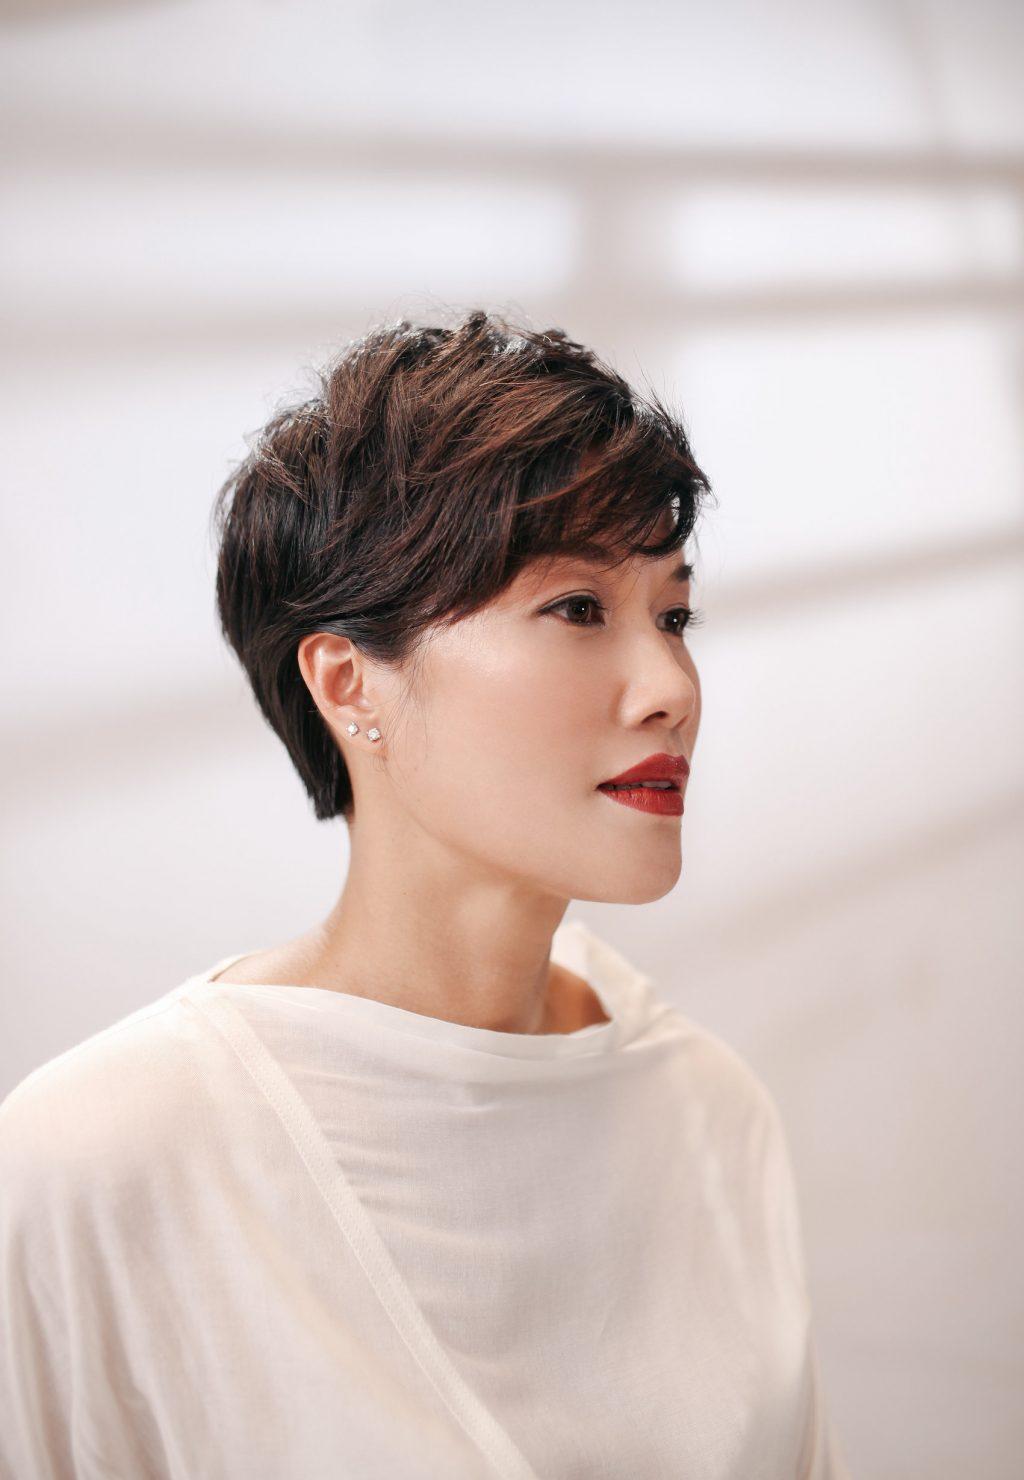 chị Kim Oanh Power of Radiance 03